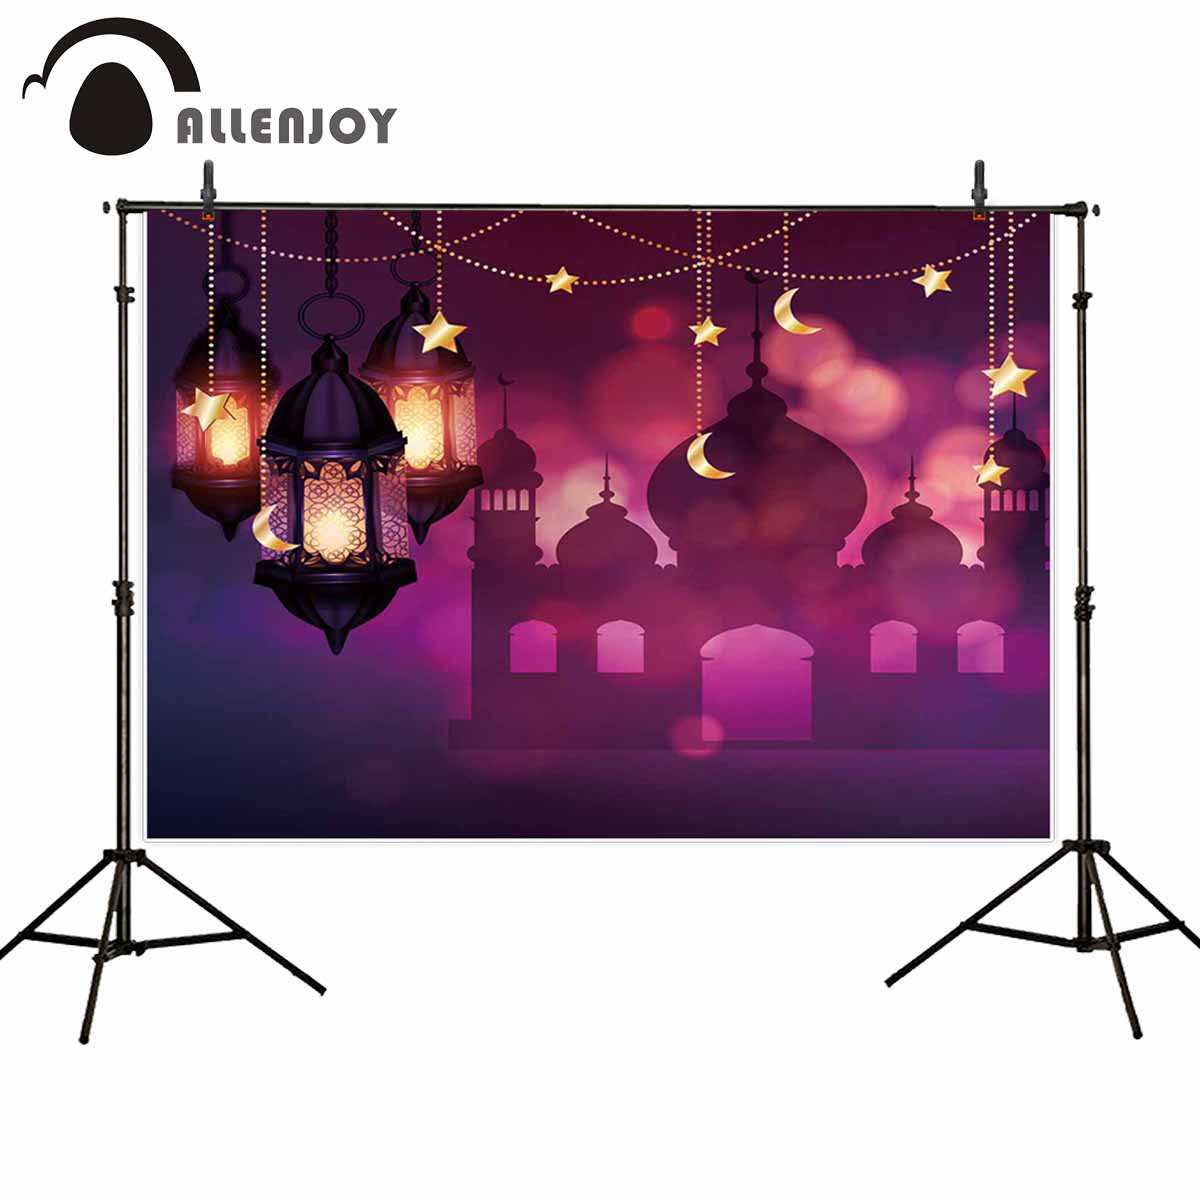 Allenjoy eid Muslim background for photo shoot Eid al-Fitr night lantern islam Ramadan Kareem photography backdrops photocall